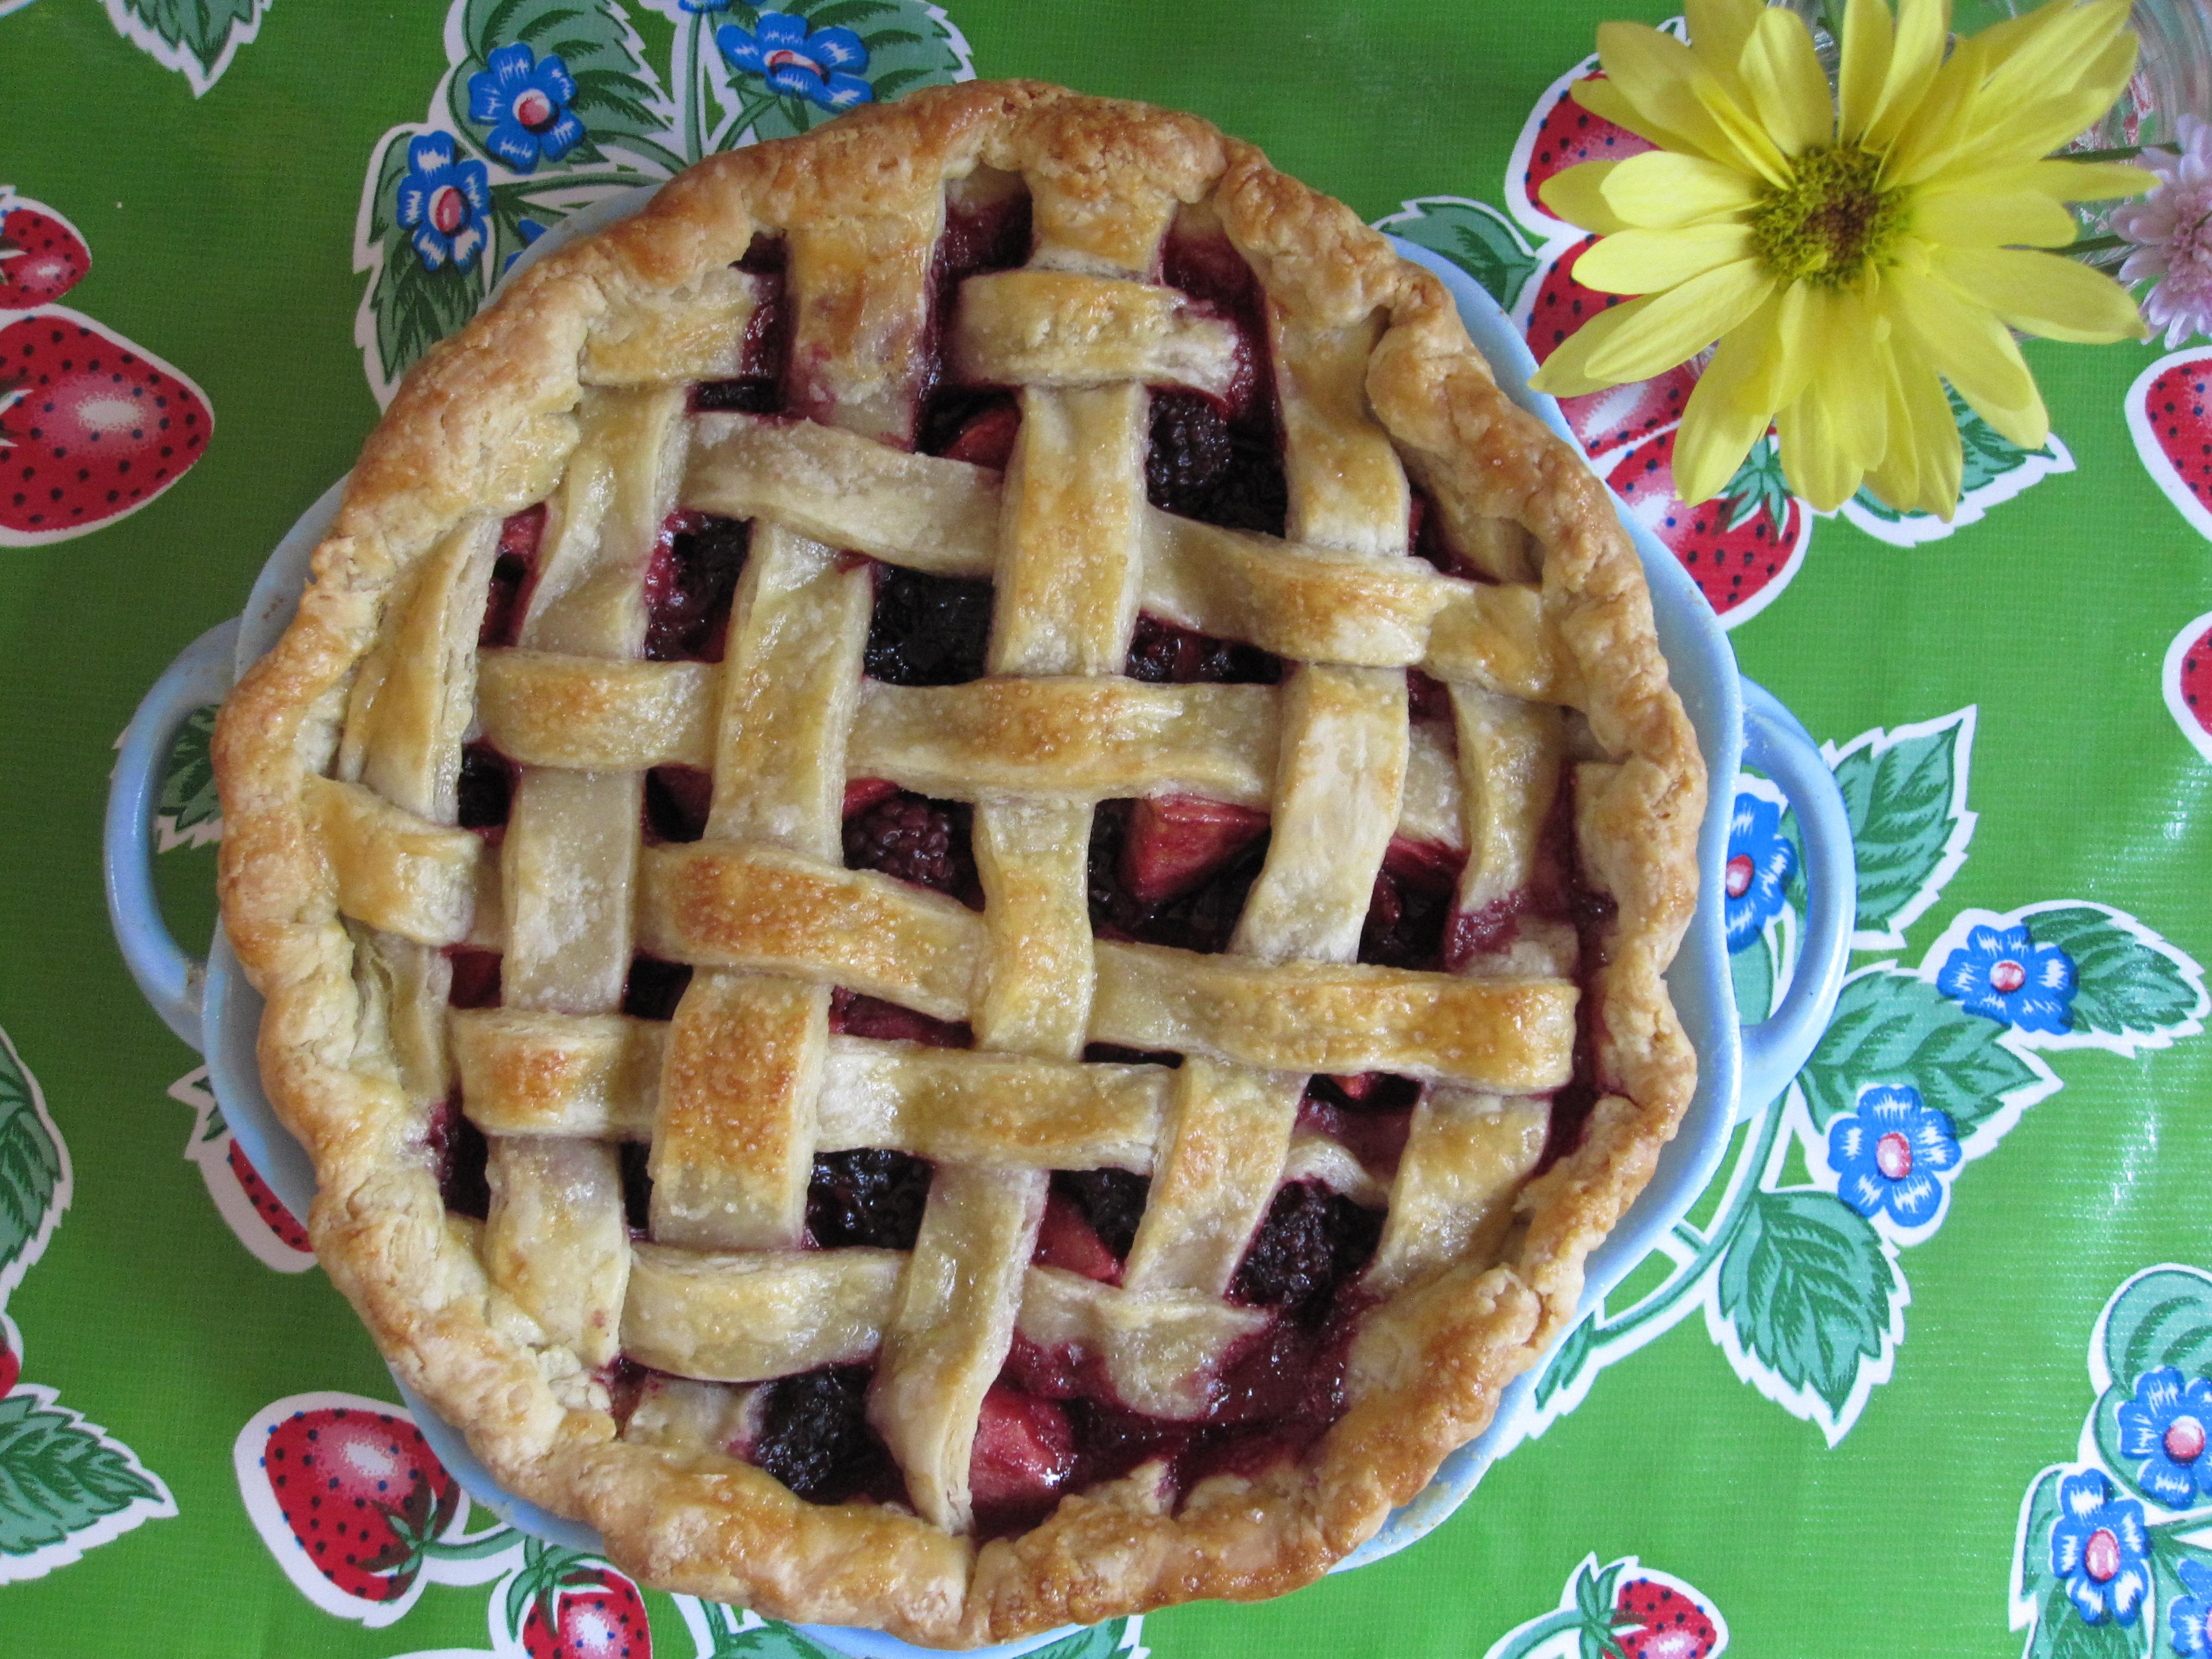 ... apple pie blackberry and apple pie blackberry and summer apple apple